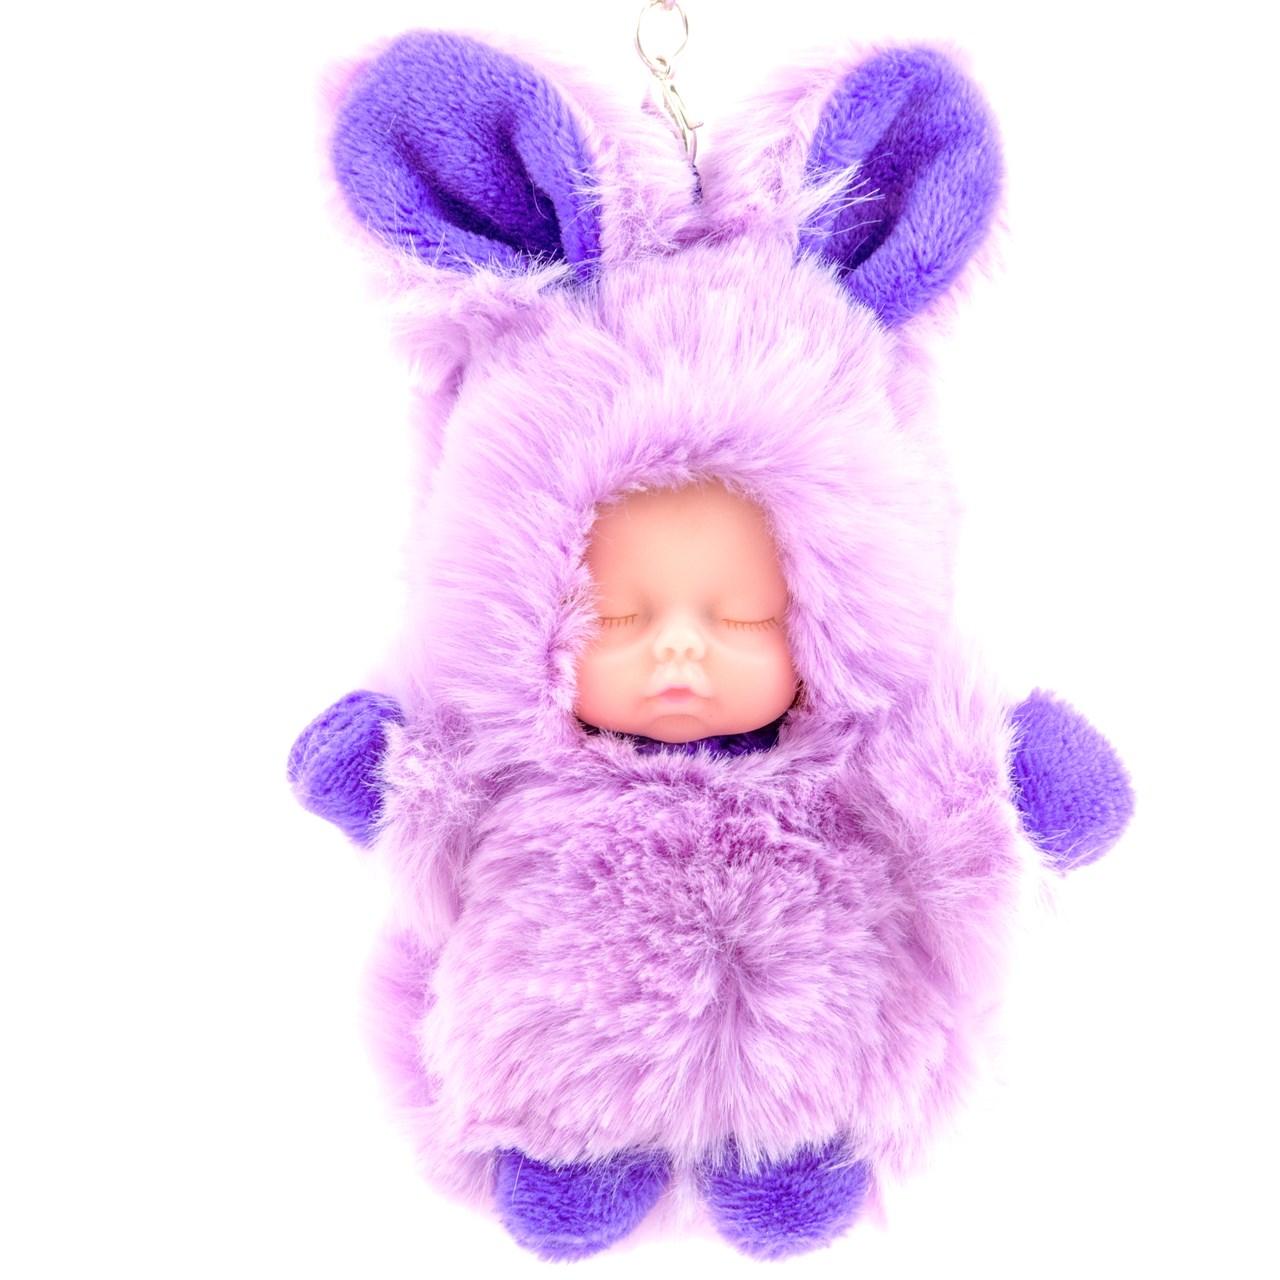 عکس آویز و جاسوئیچی نوزاد لاکچری مدل Purple Rabbit Dress